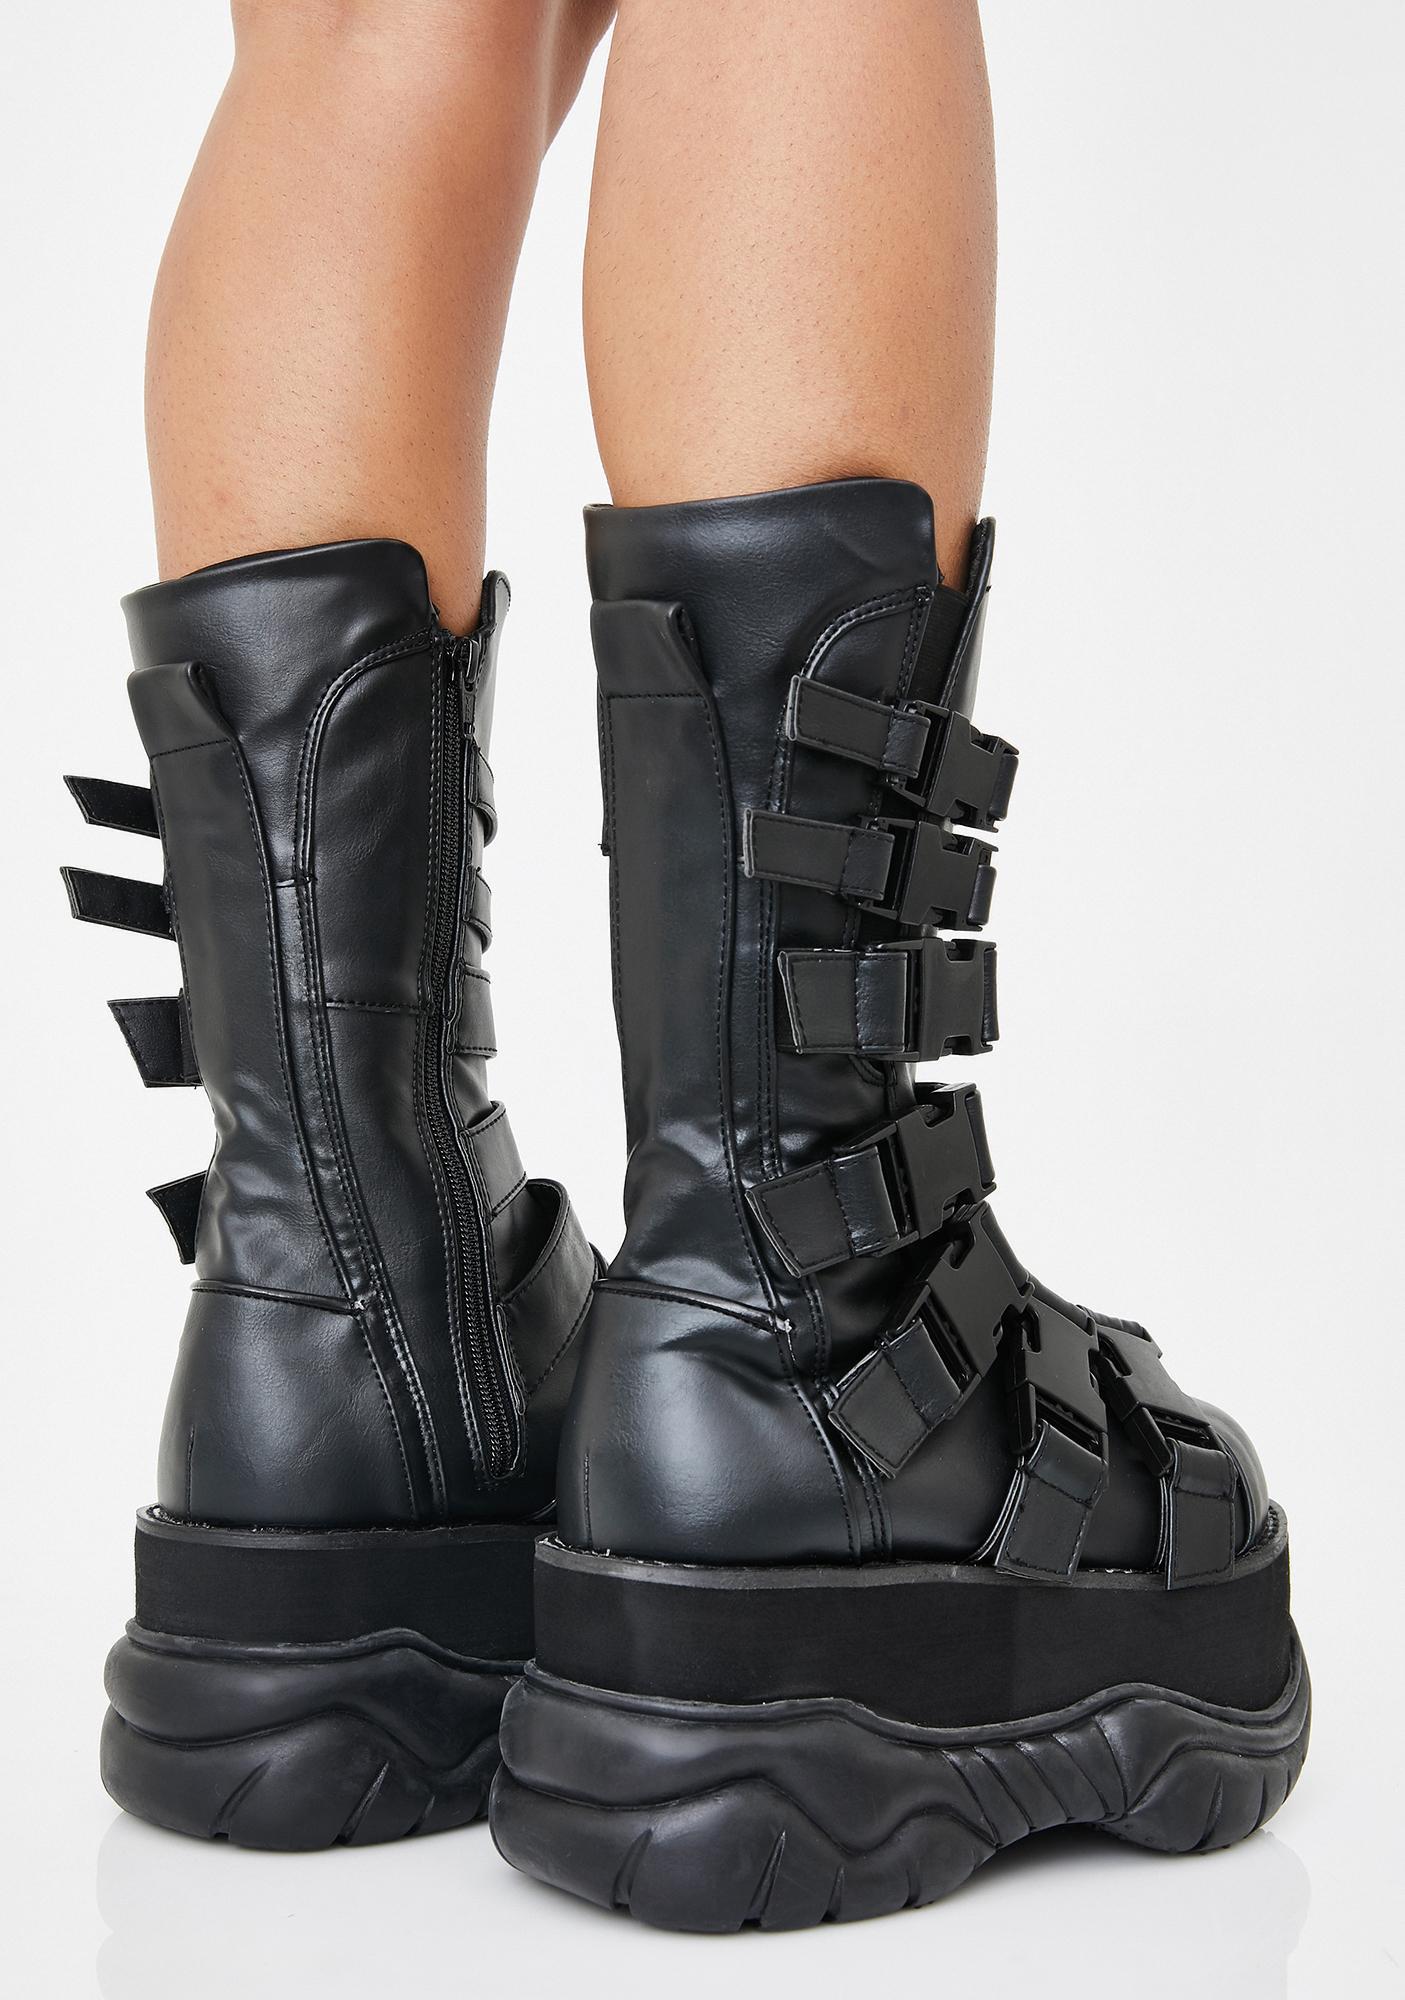 Demonia Neptune War Platform Boots